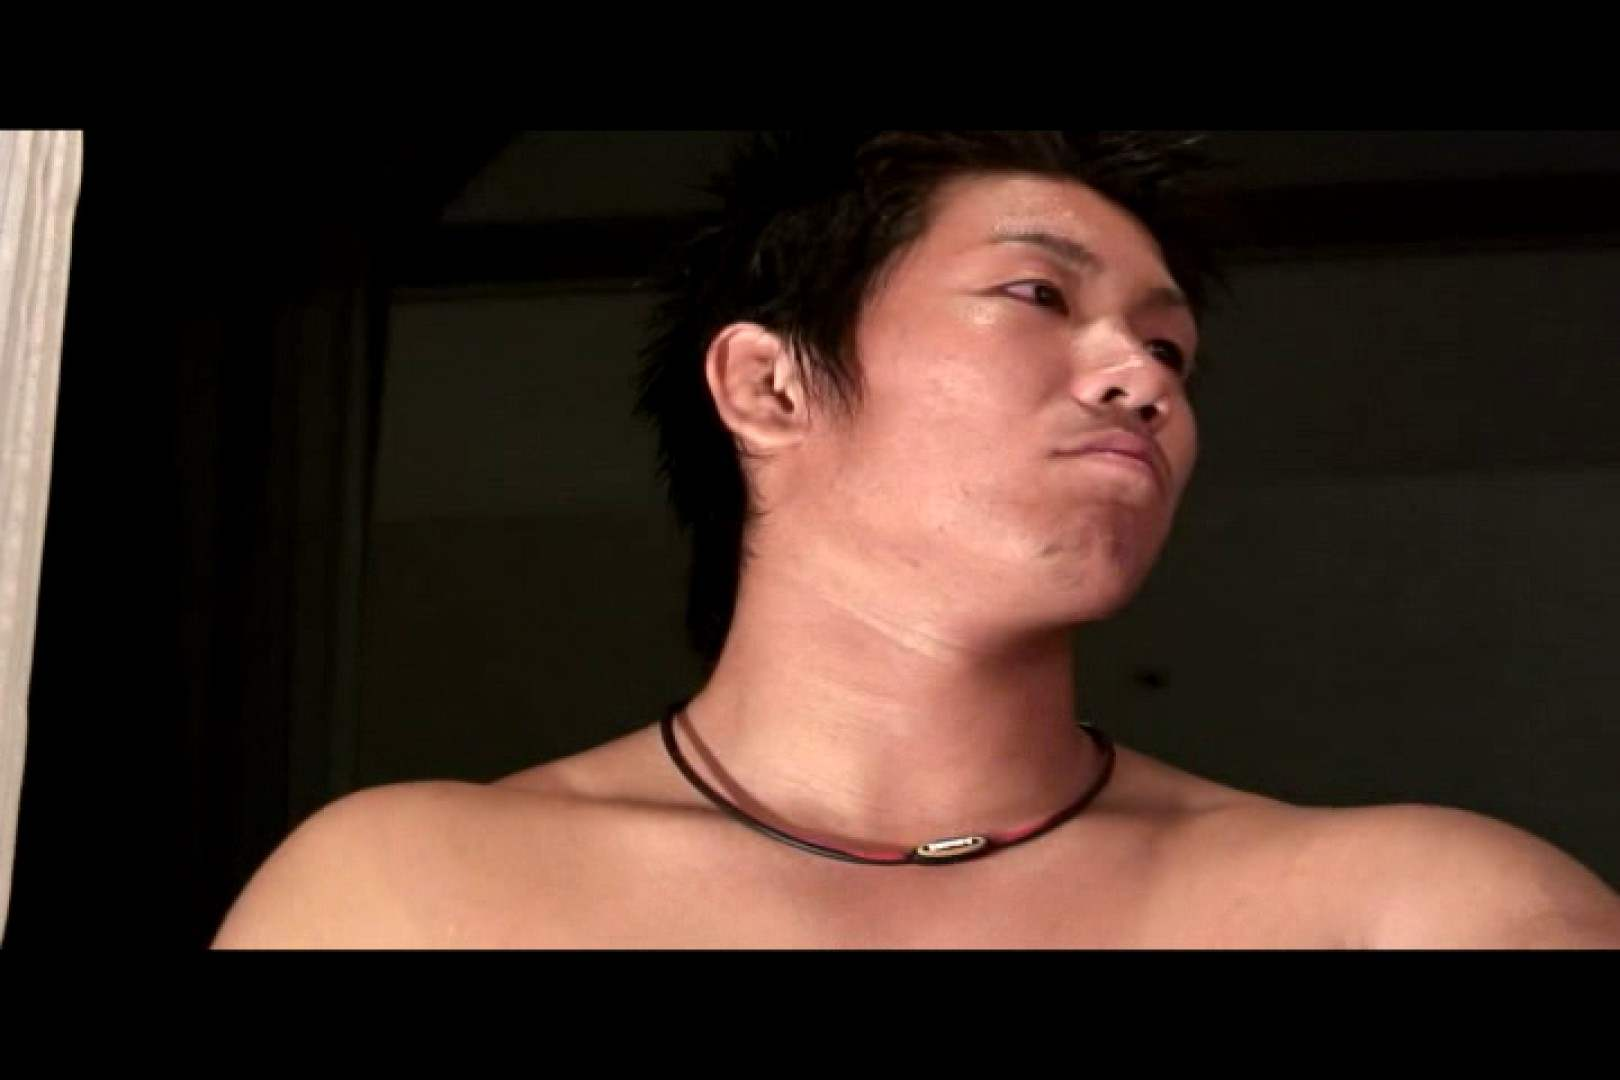 Bistro「イケメン」~Mokkori和風仕立て~vol.03 受け  55pic 17